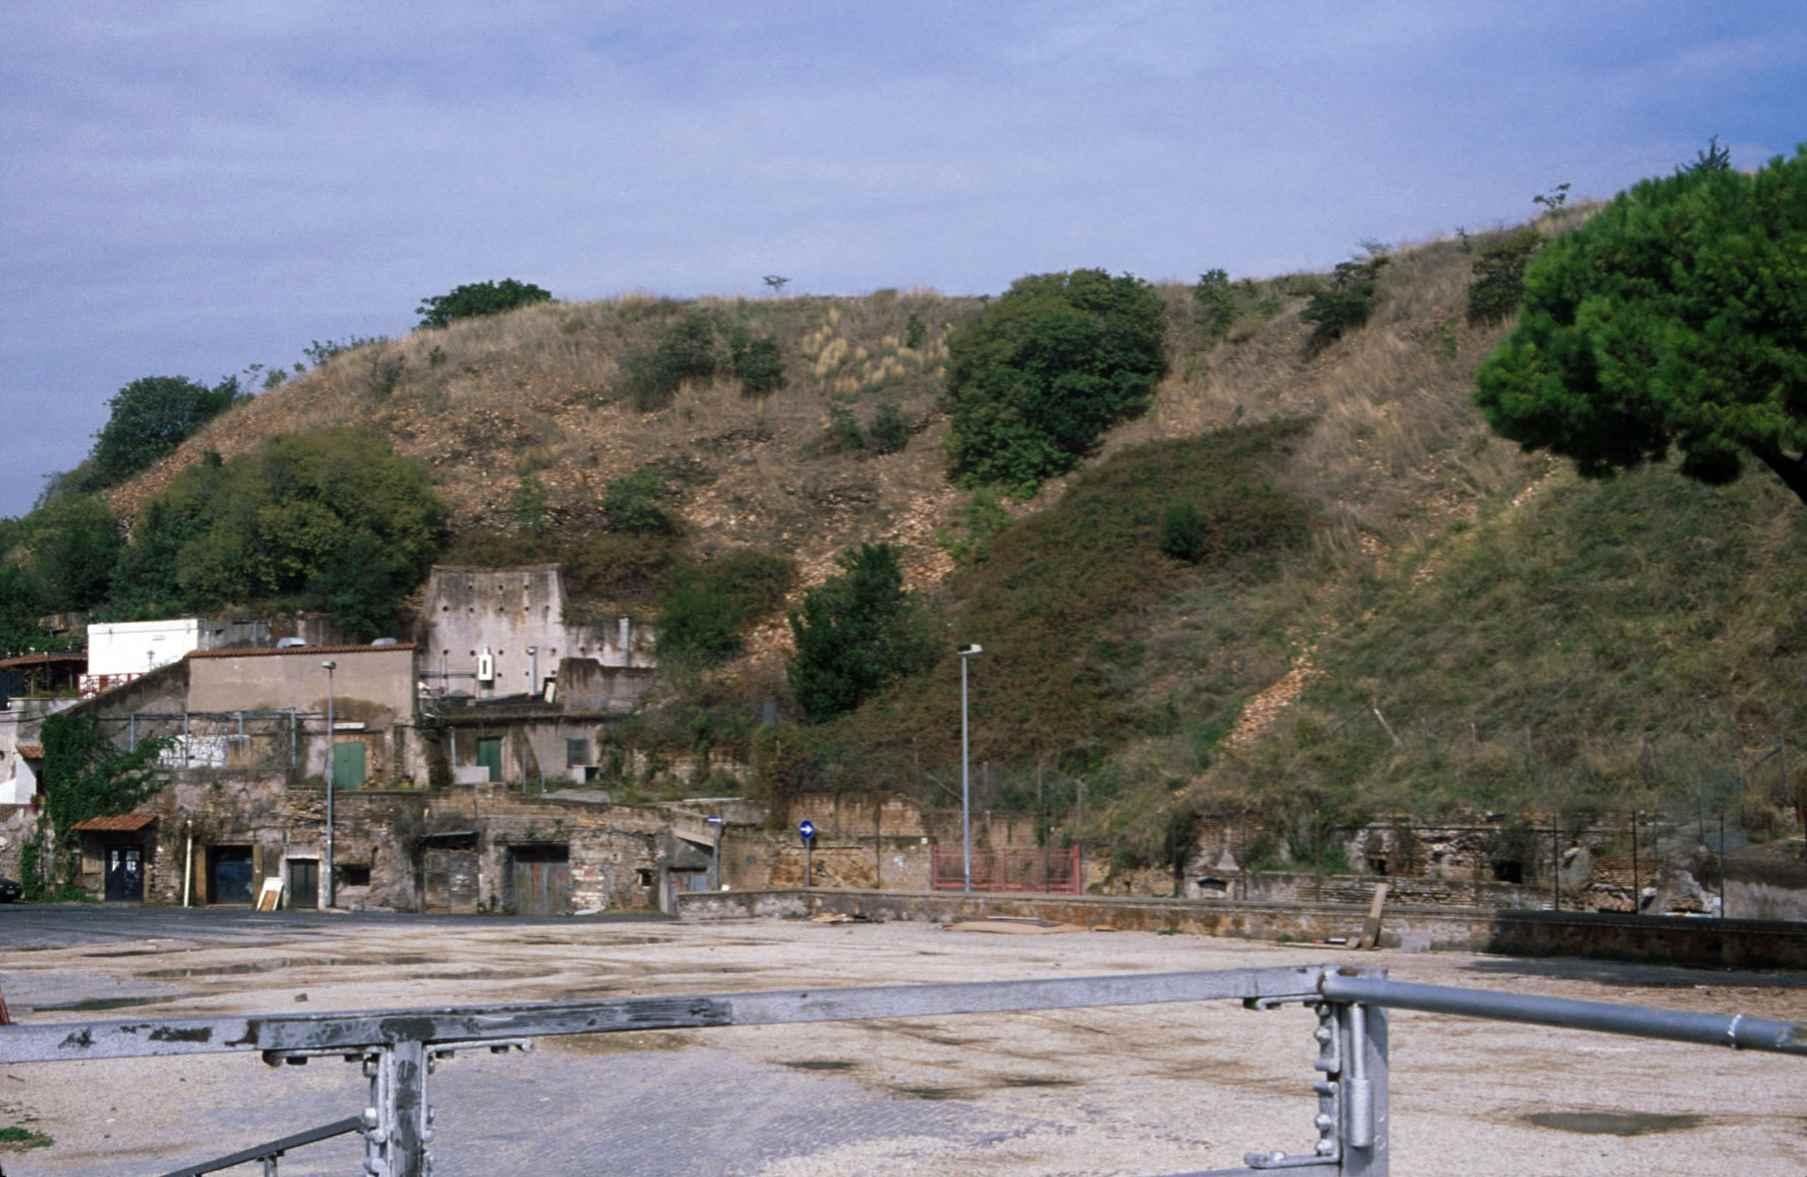 View of the hill of Monte Testaccio